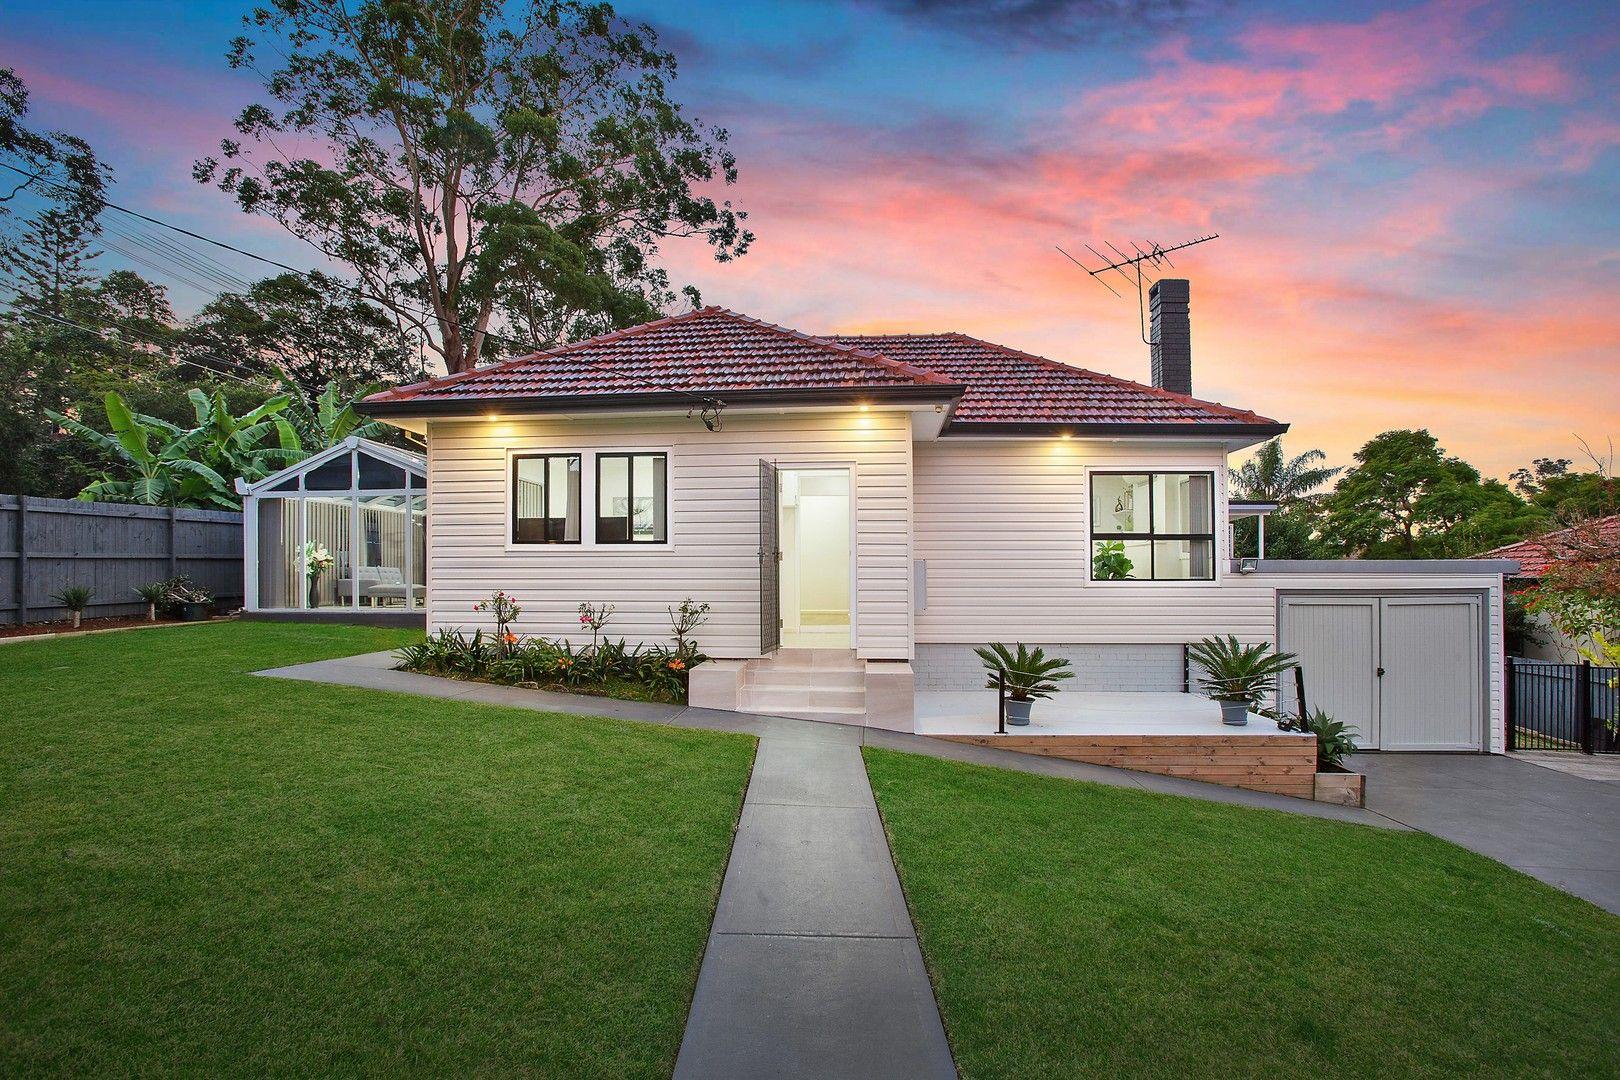 1 Lochville Street, Wahroonga NSW 2076, Image 0